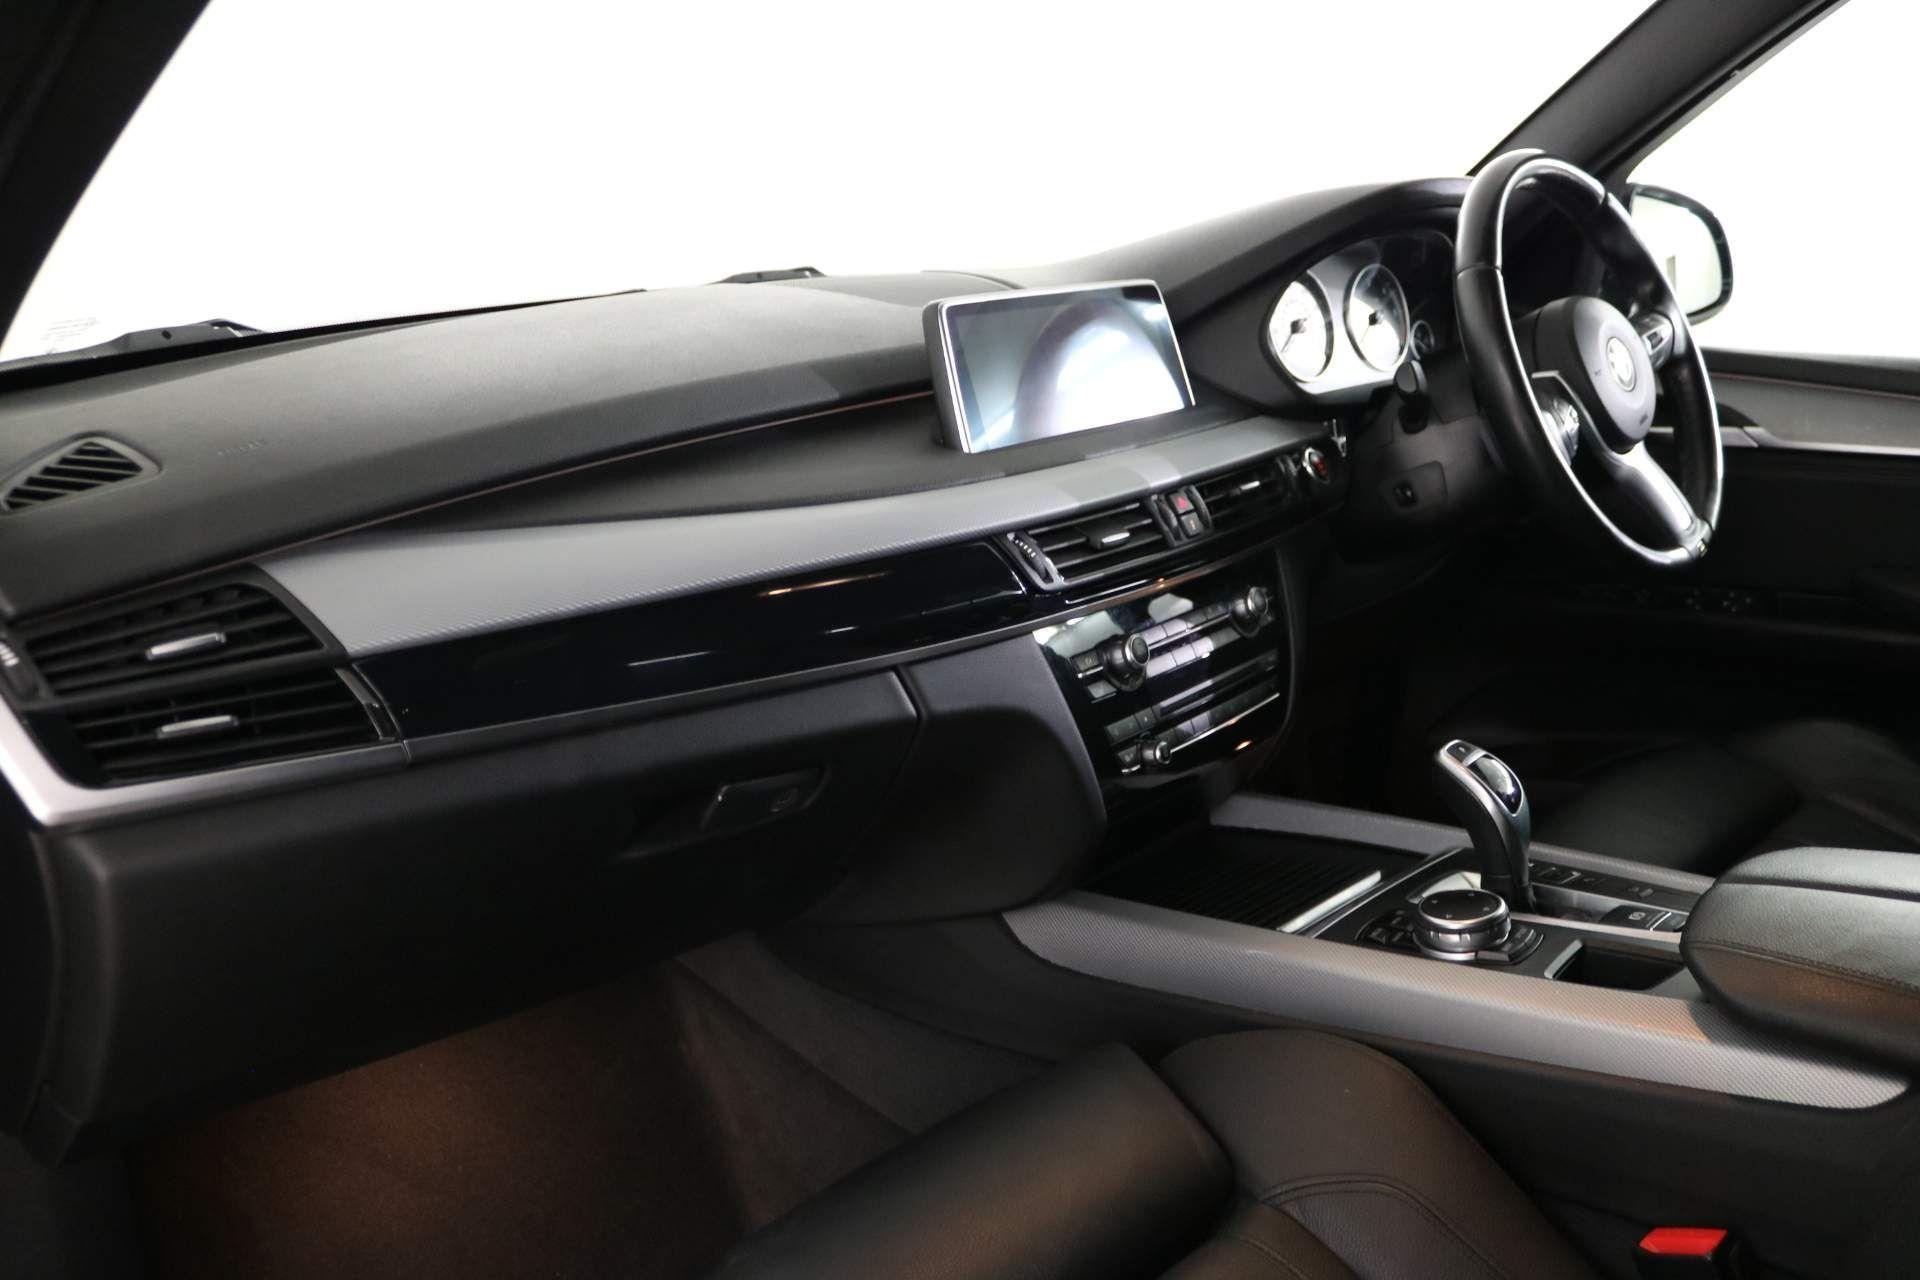 "BMW X5 3.0d xDrive""Auto"" Special Equipment - 15 Reg - 7 Seater -Leather - Sat Nav -Mega Spec- No Vat - Image 9 of 13"